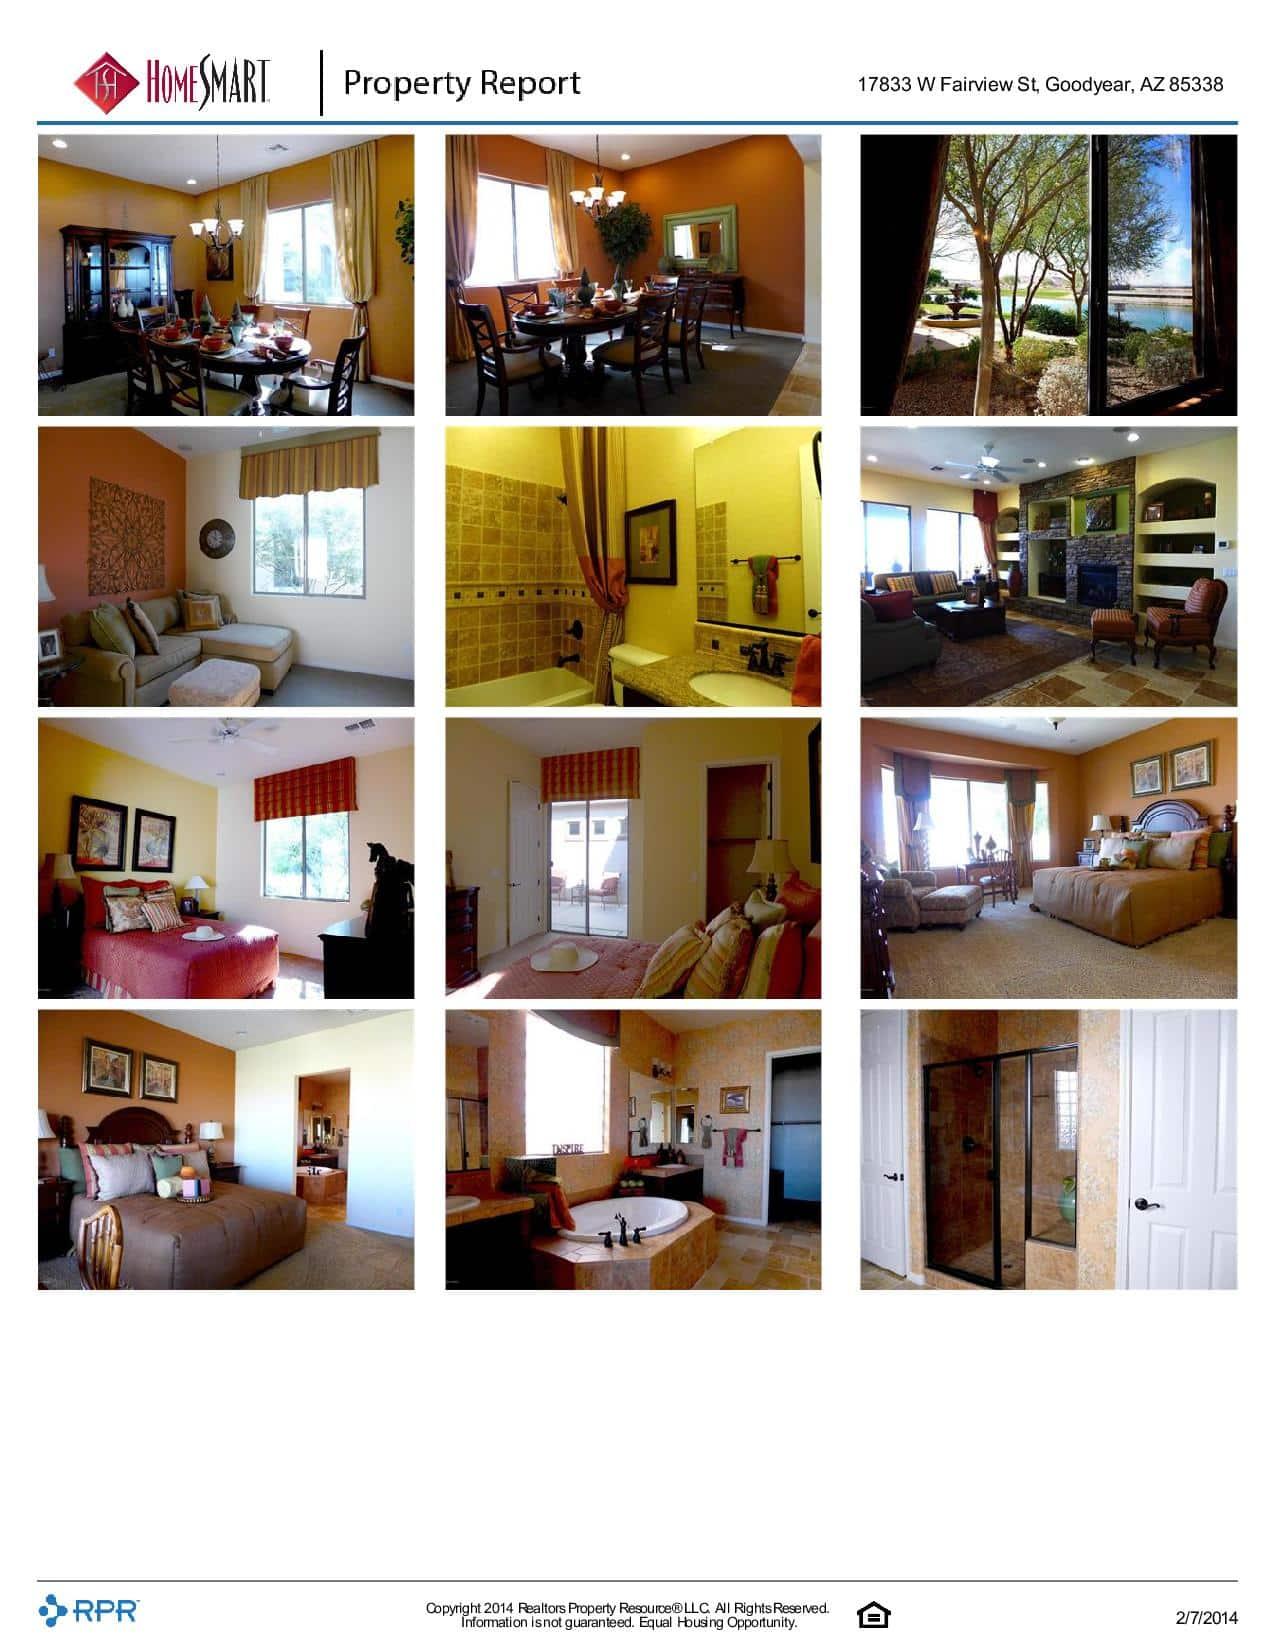 17833-W-Fairview-St-Goodyear-AZ-85338.pdf-page-006